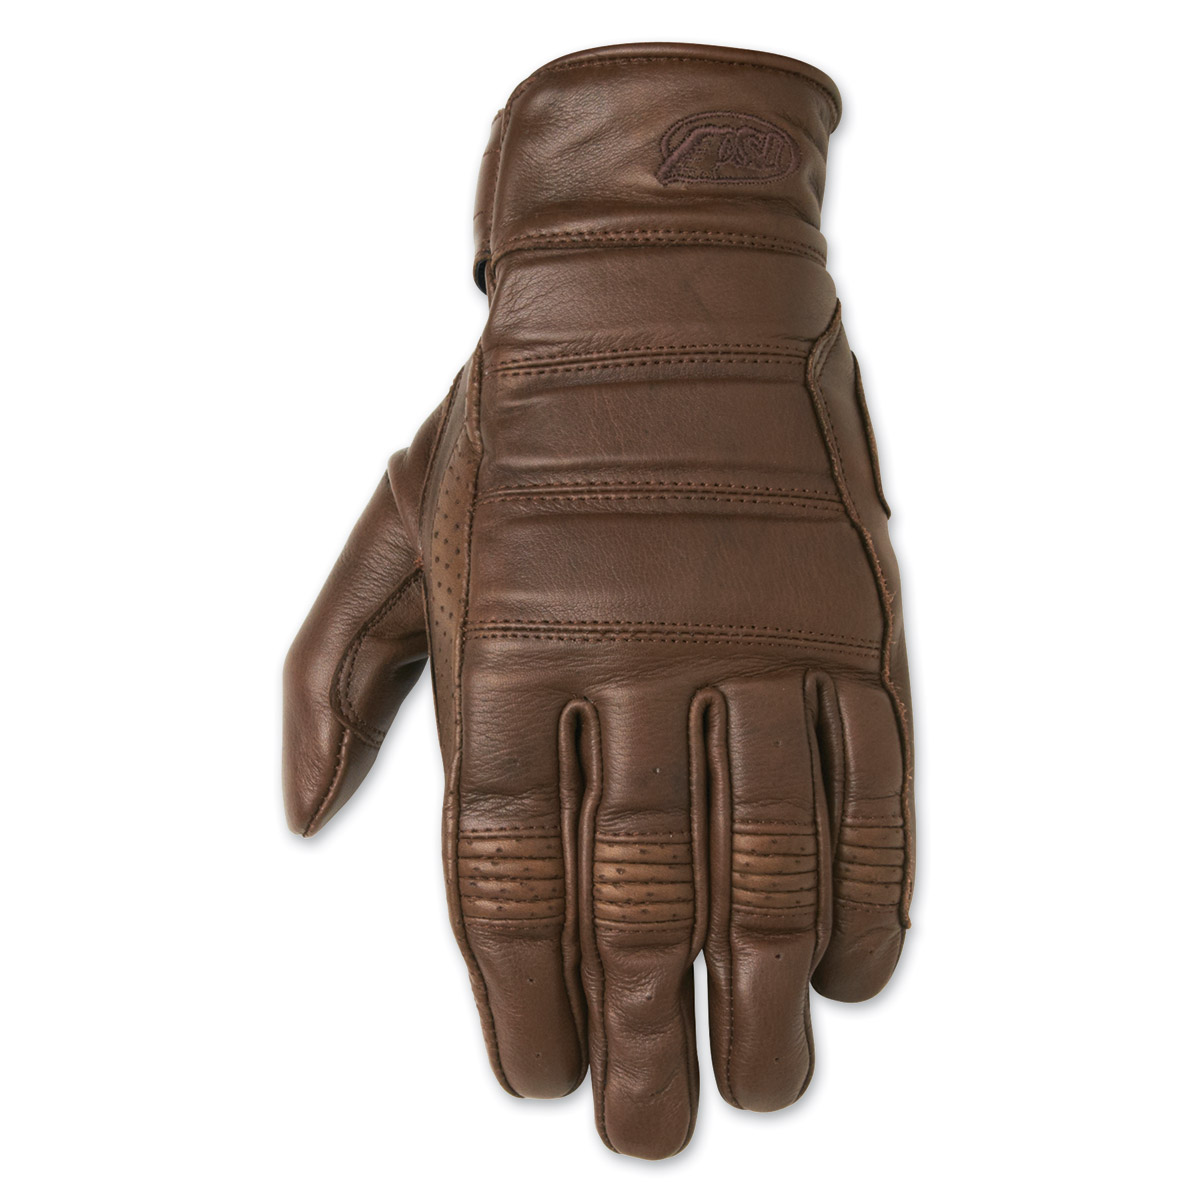 Roland Sands Design Ronin Men's Tobacco Brown Leather Gloves